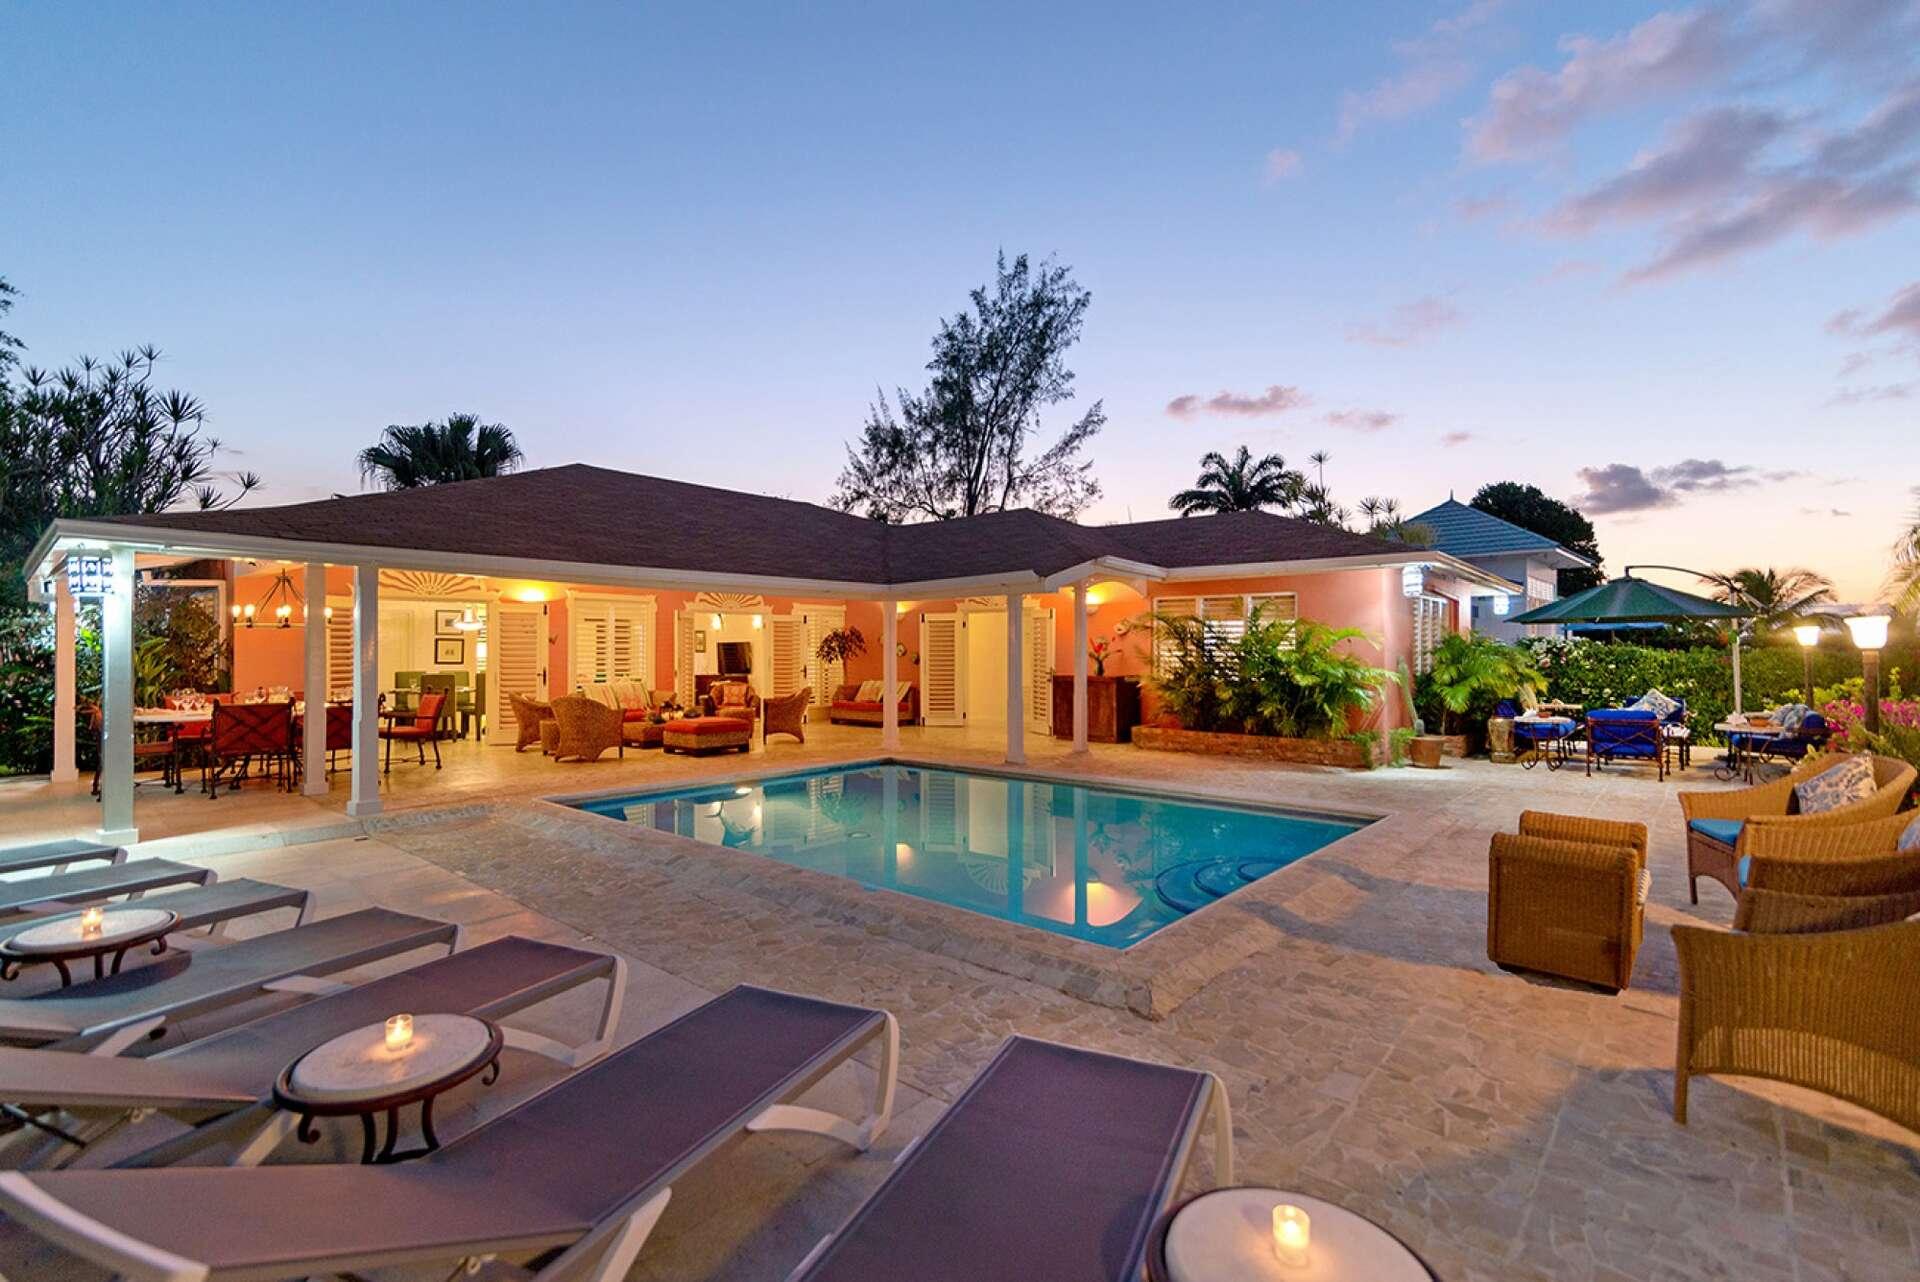 Luxury villa rentals caribbean - Jamaica - Silver sands - Summertime - Image 1/14